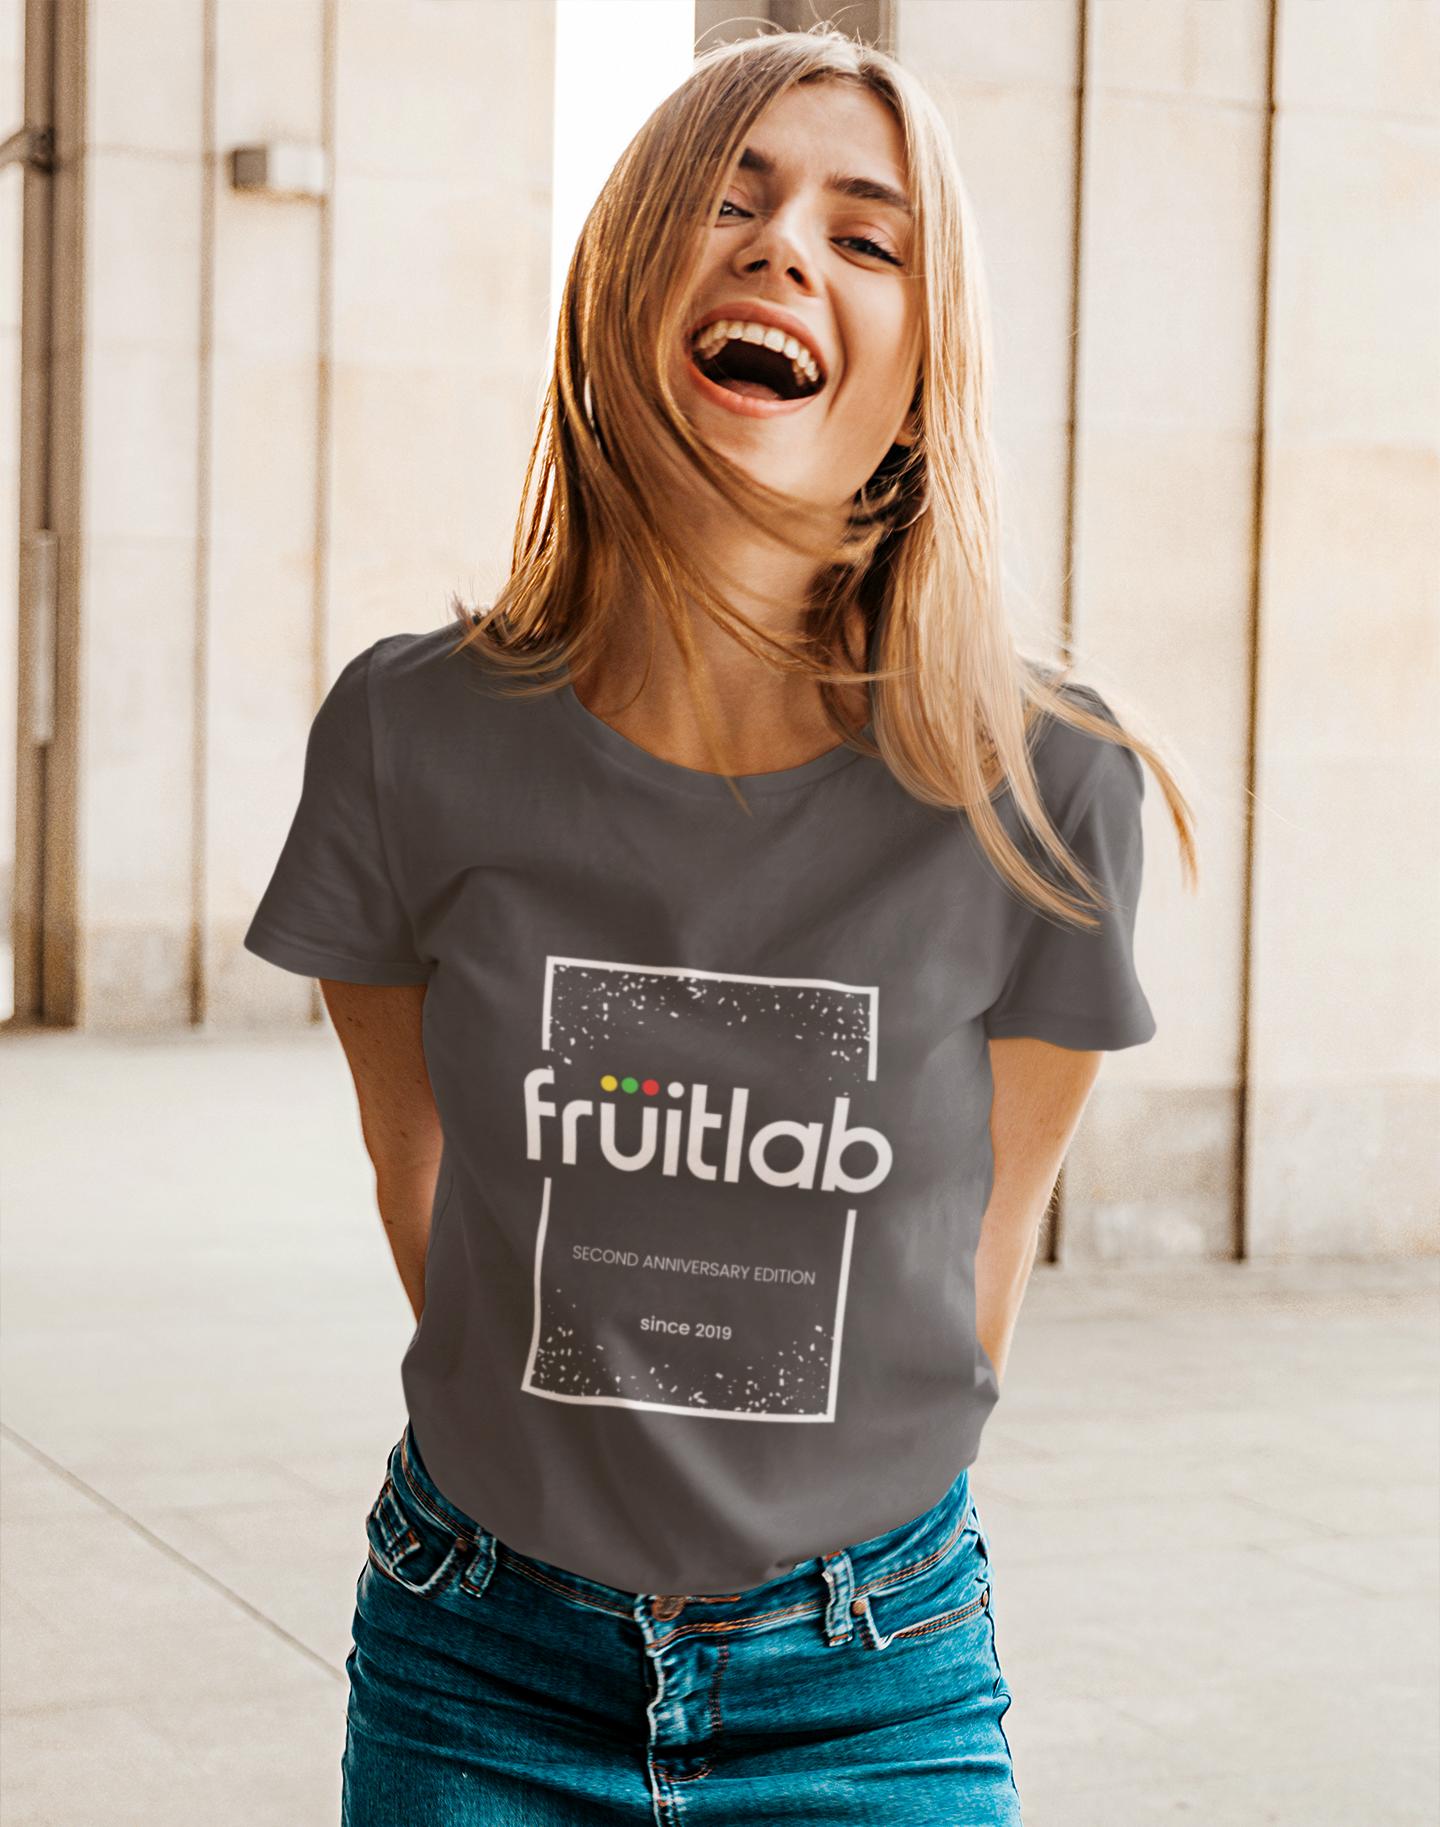 fruitlab Second Anniversary T-shirt